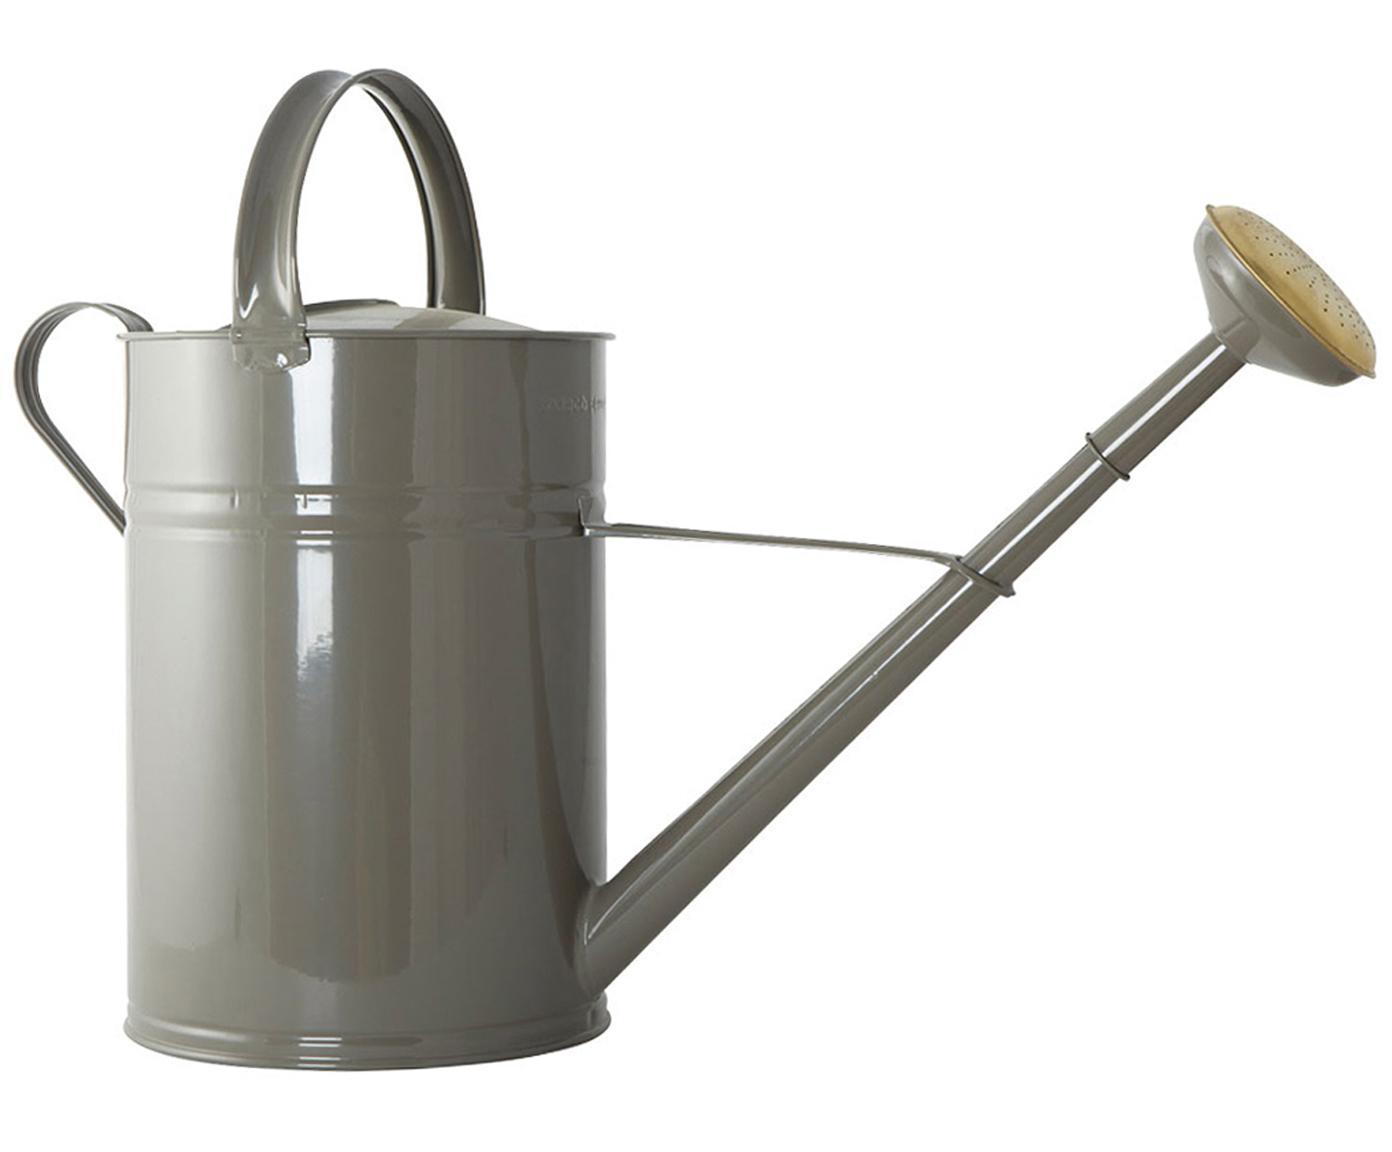 Gieter Nanny, Gelakt metaal, Grijs, messingkleurig, 22 x 45 cm